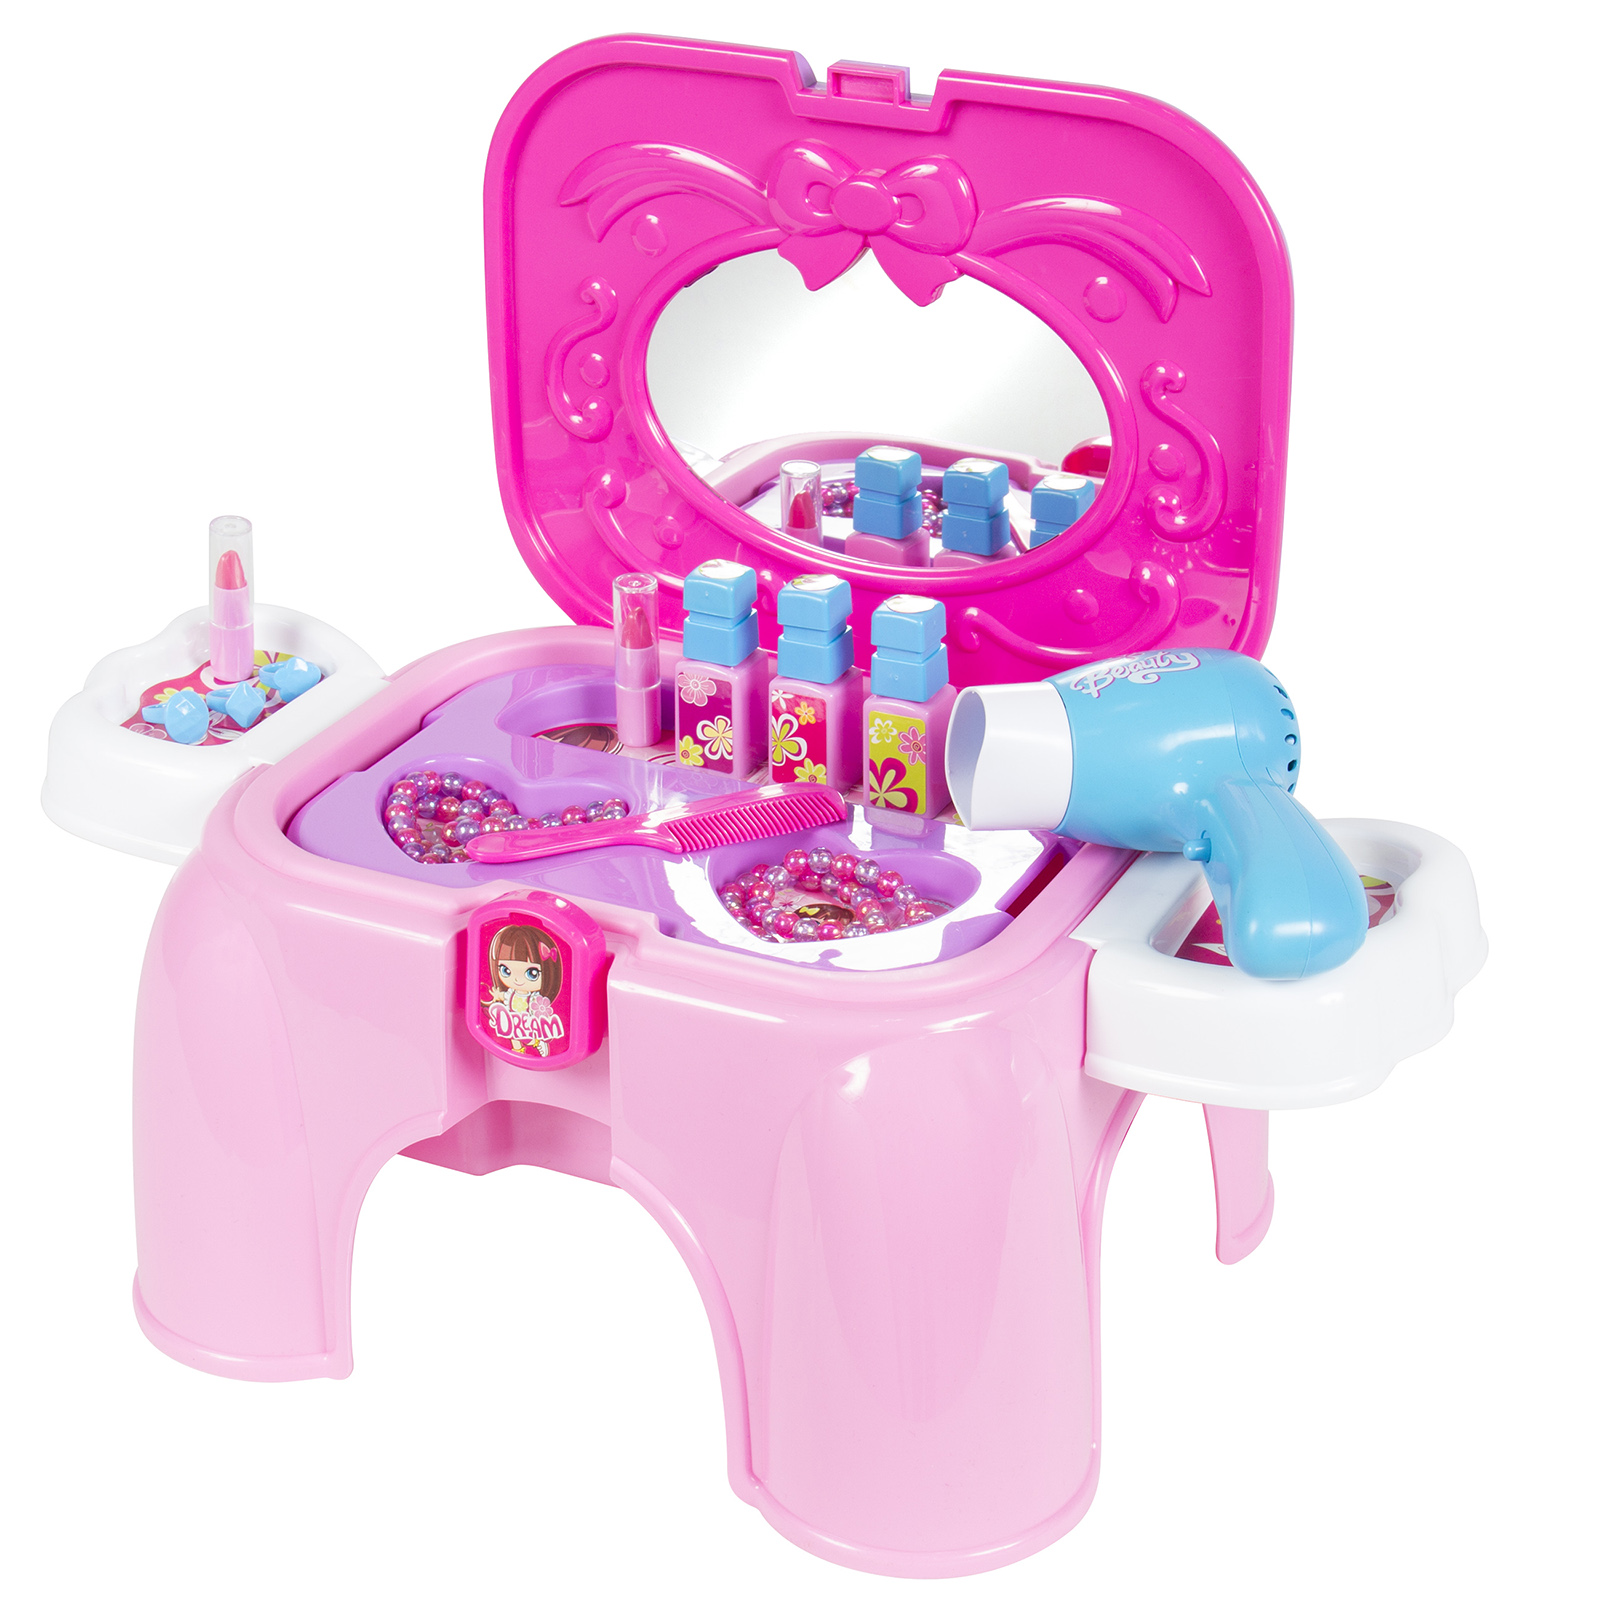 Sears Bestchoiceproducts Kids Toy Vanity Cosmetic Pretend